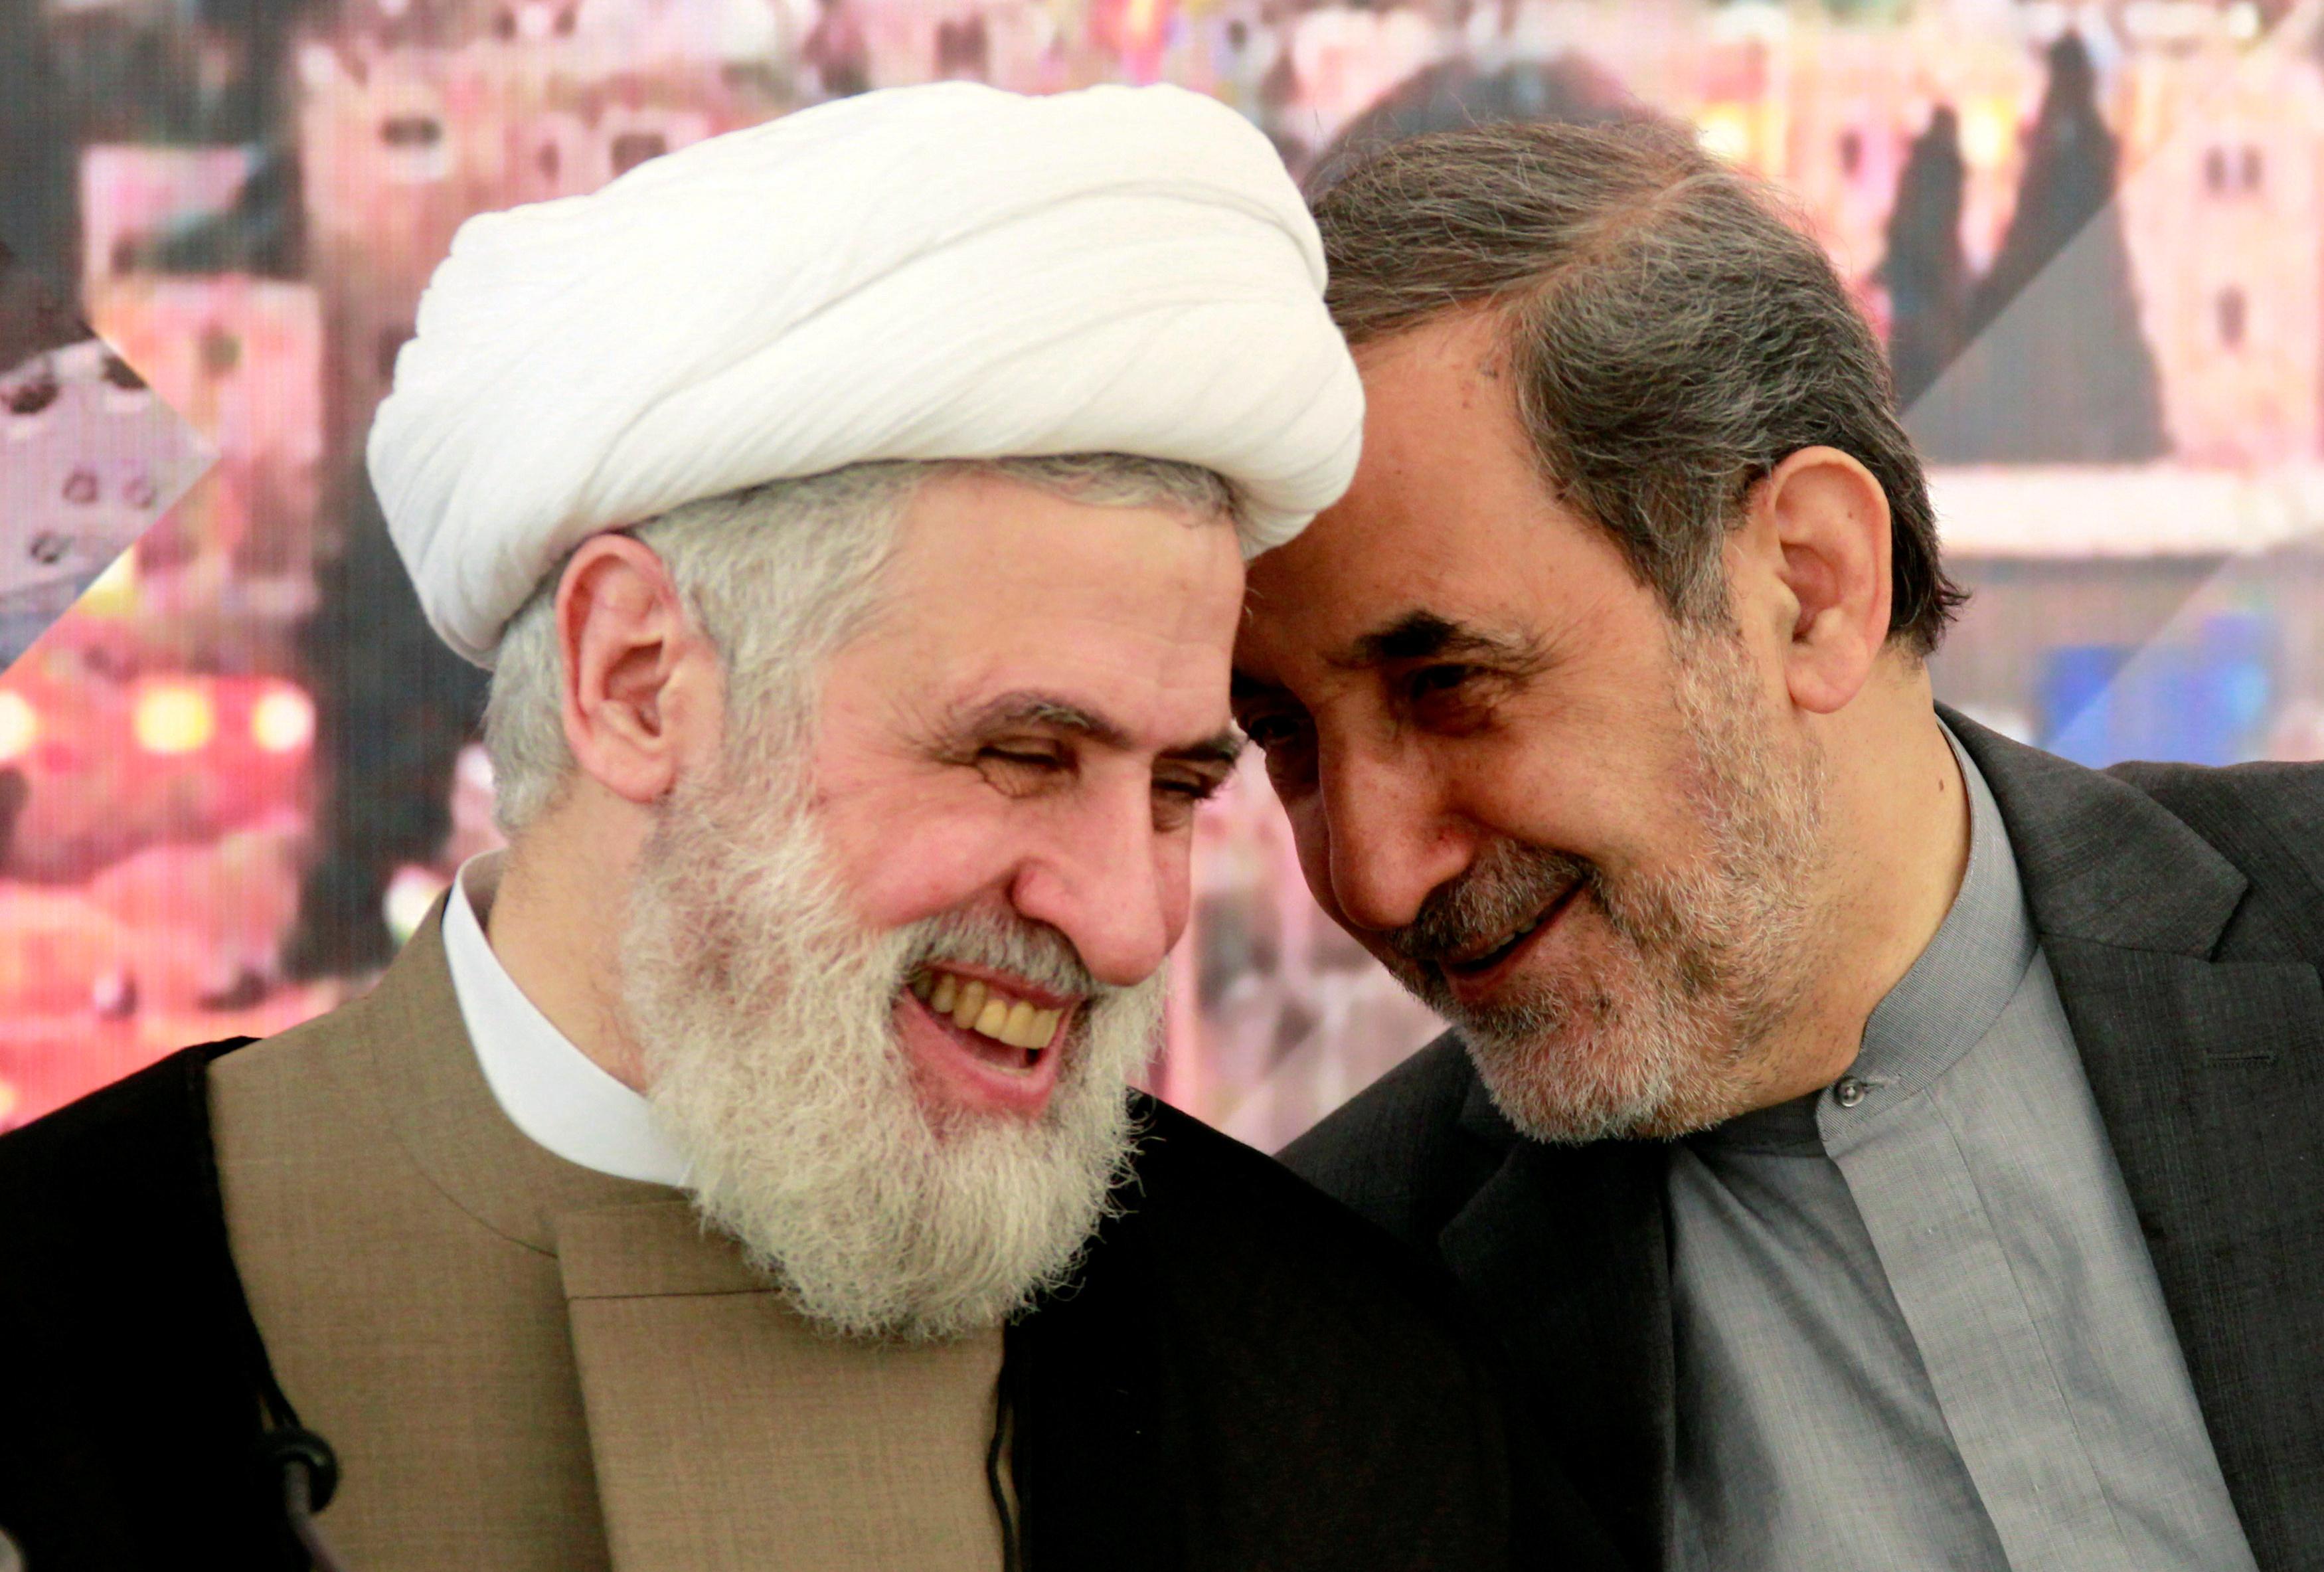 Top Khamenei aide hails Iran's downing of U.S. drone, tanker seizure